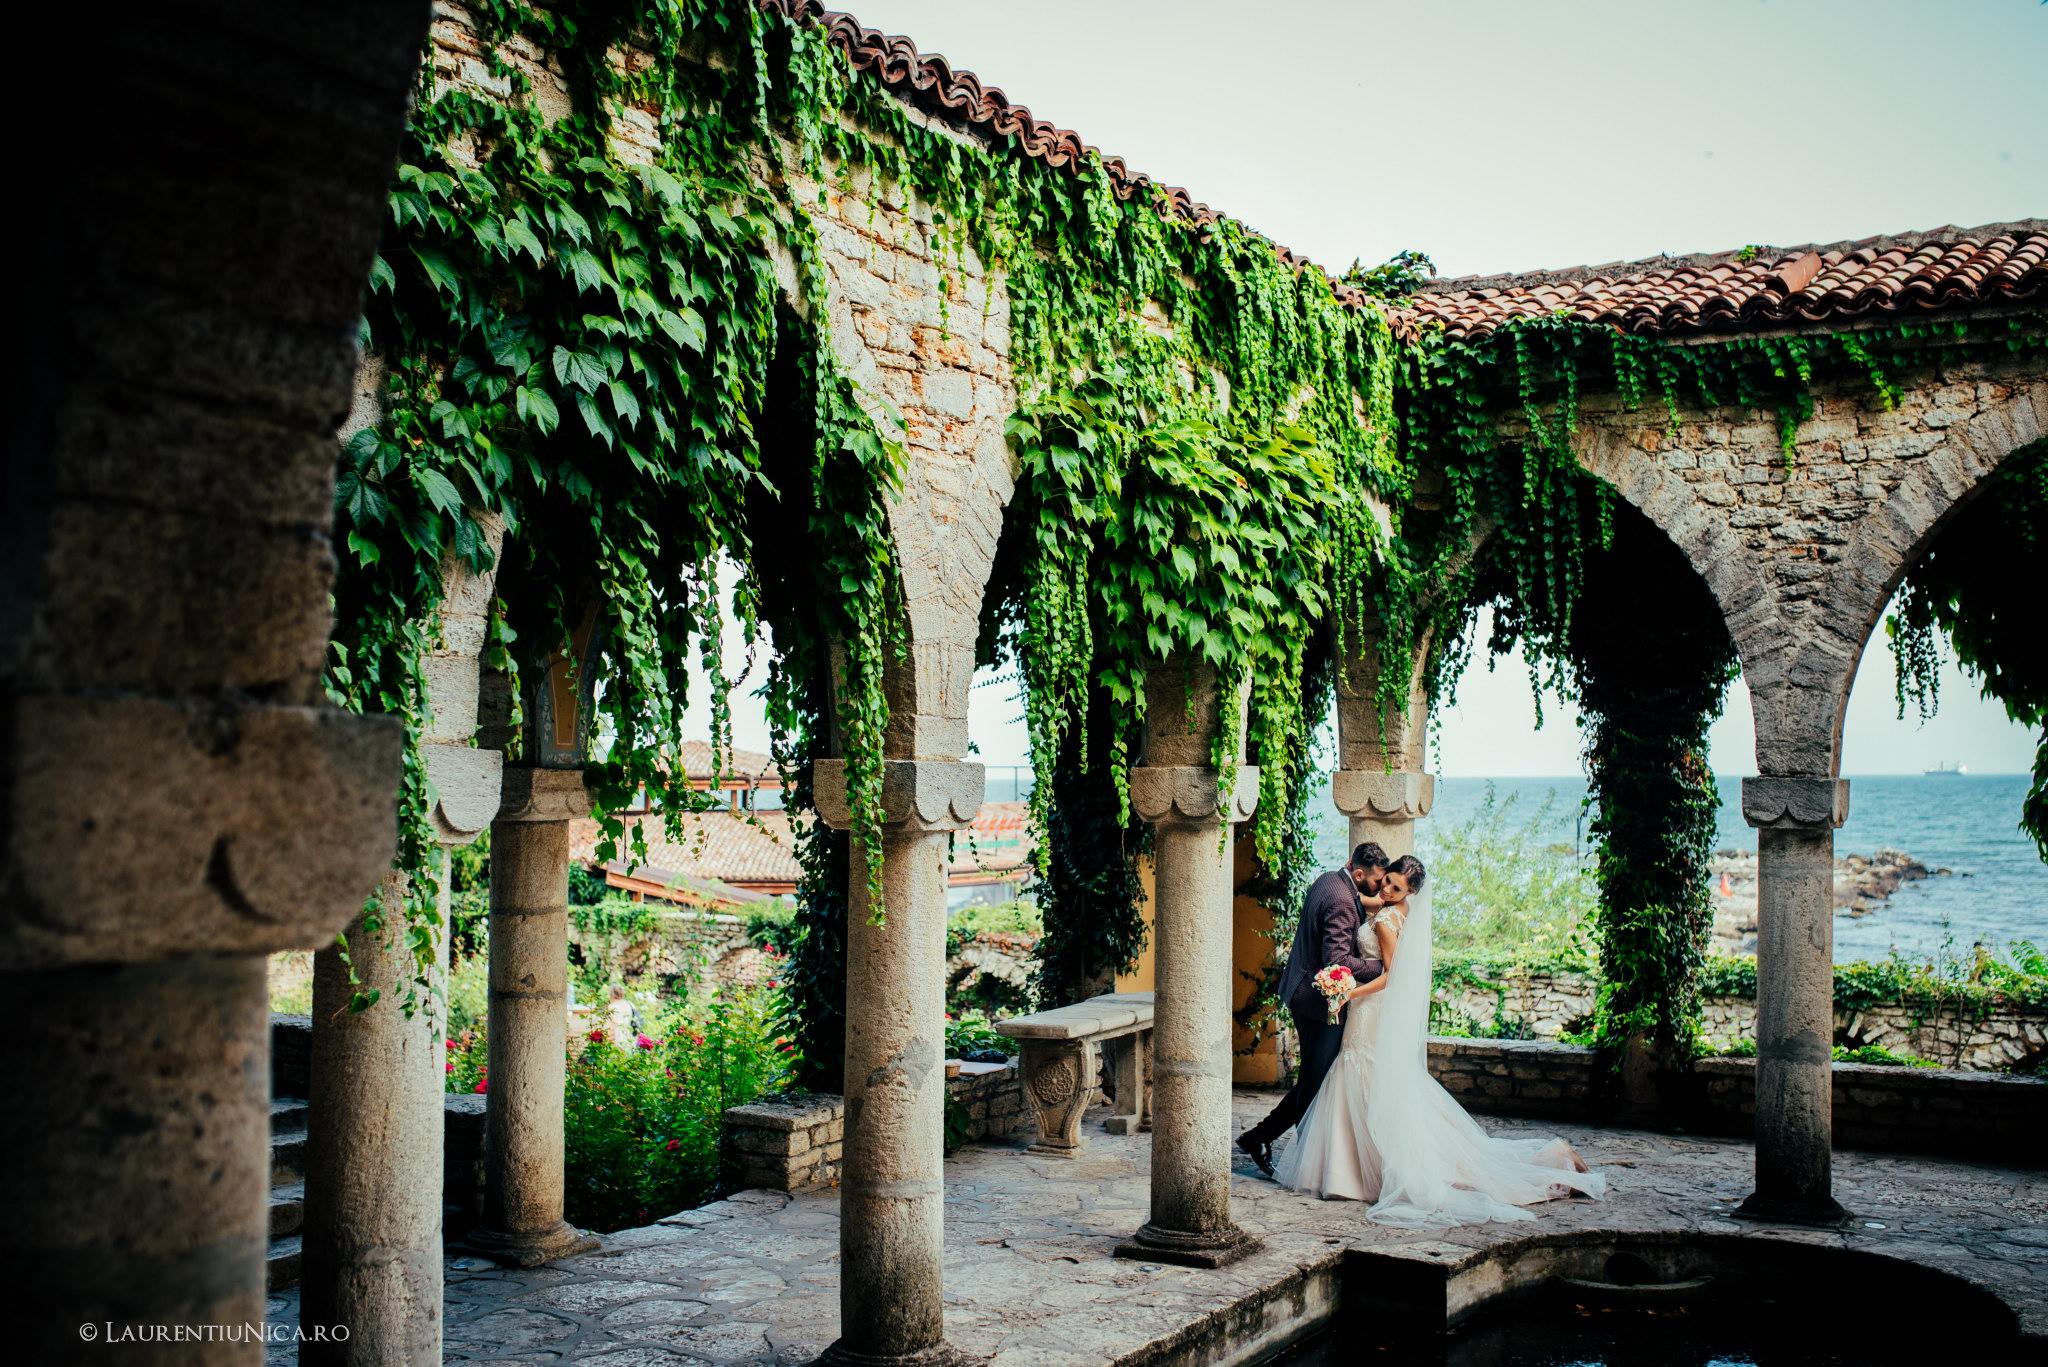 andreea si alin fotografii after wedding balchik bulgaria24 - Andreea & Alin | Fotografii After Wedding | Balchik Bulgaria